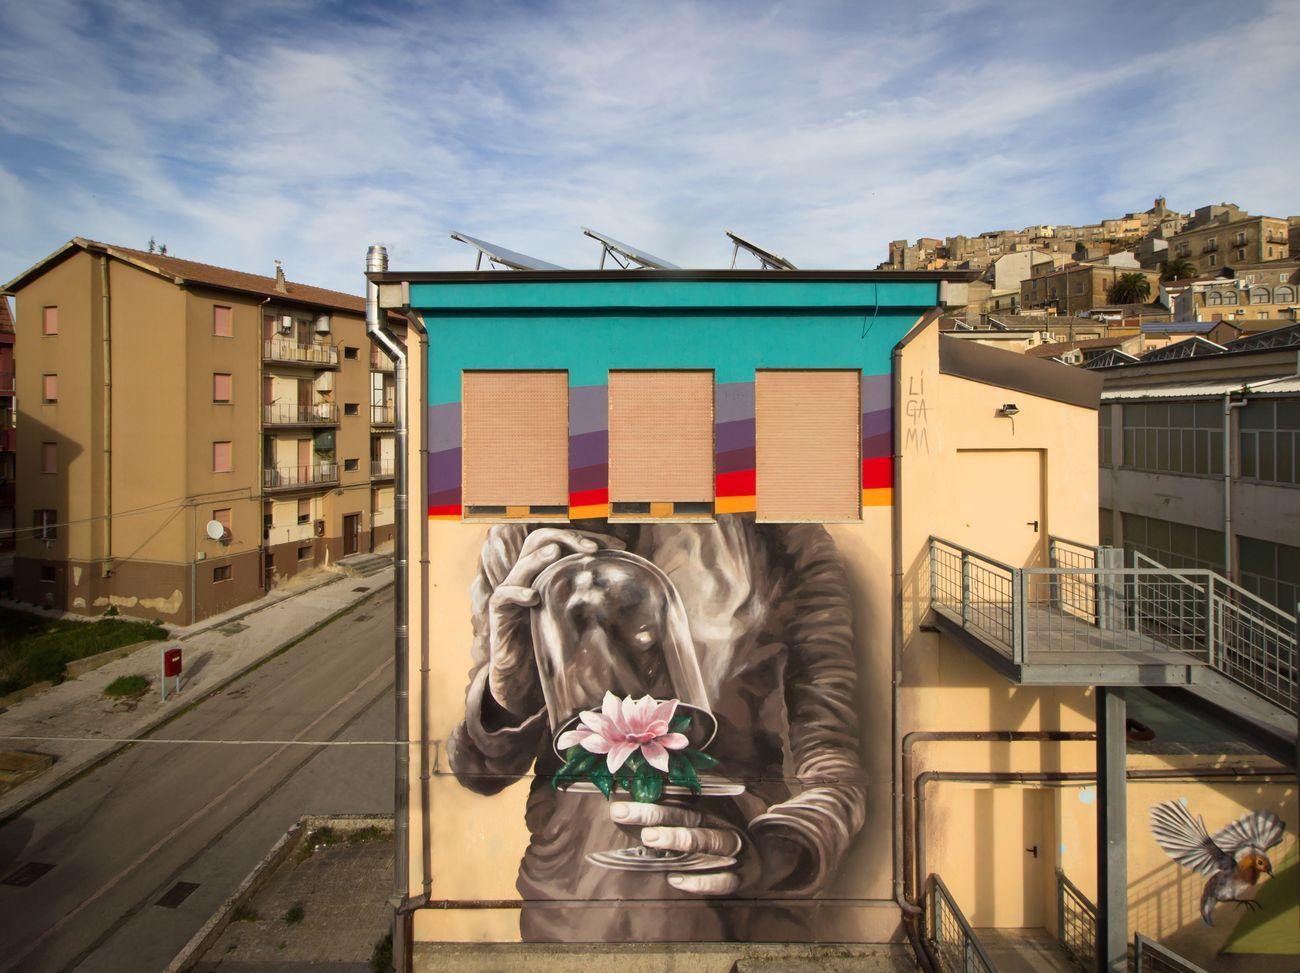 Liberami e proteggimi, Calascibetta (En), 2020